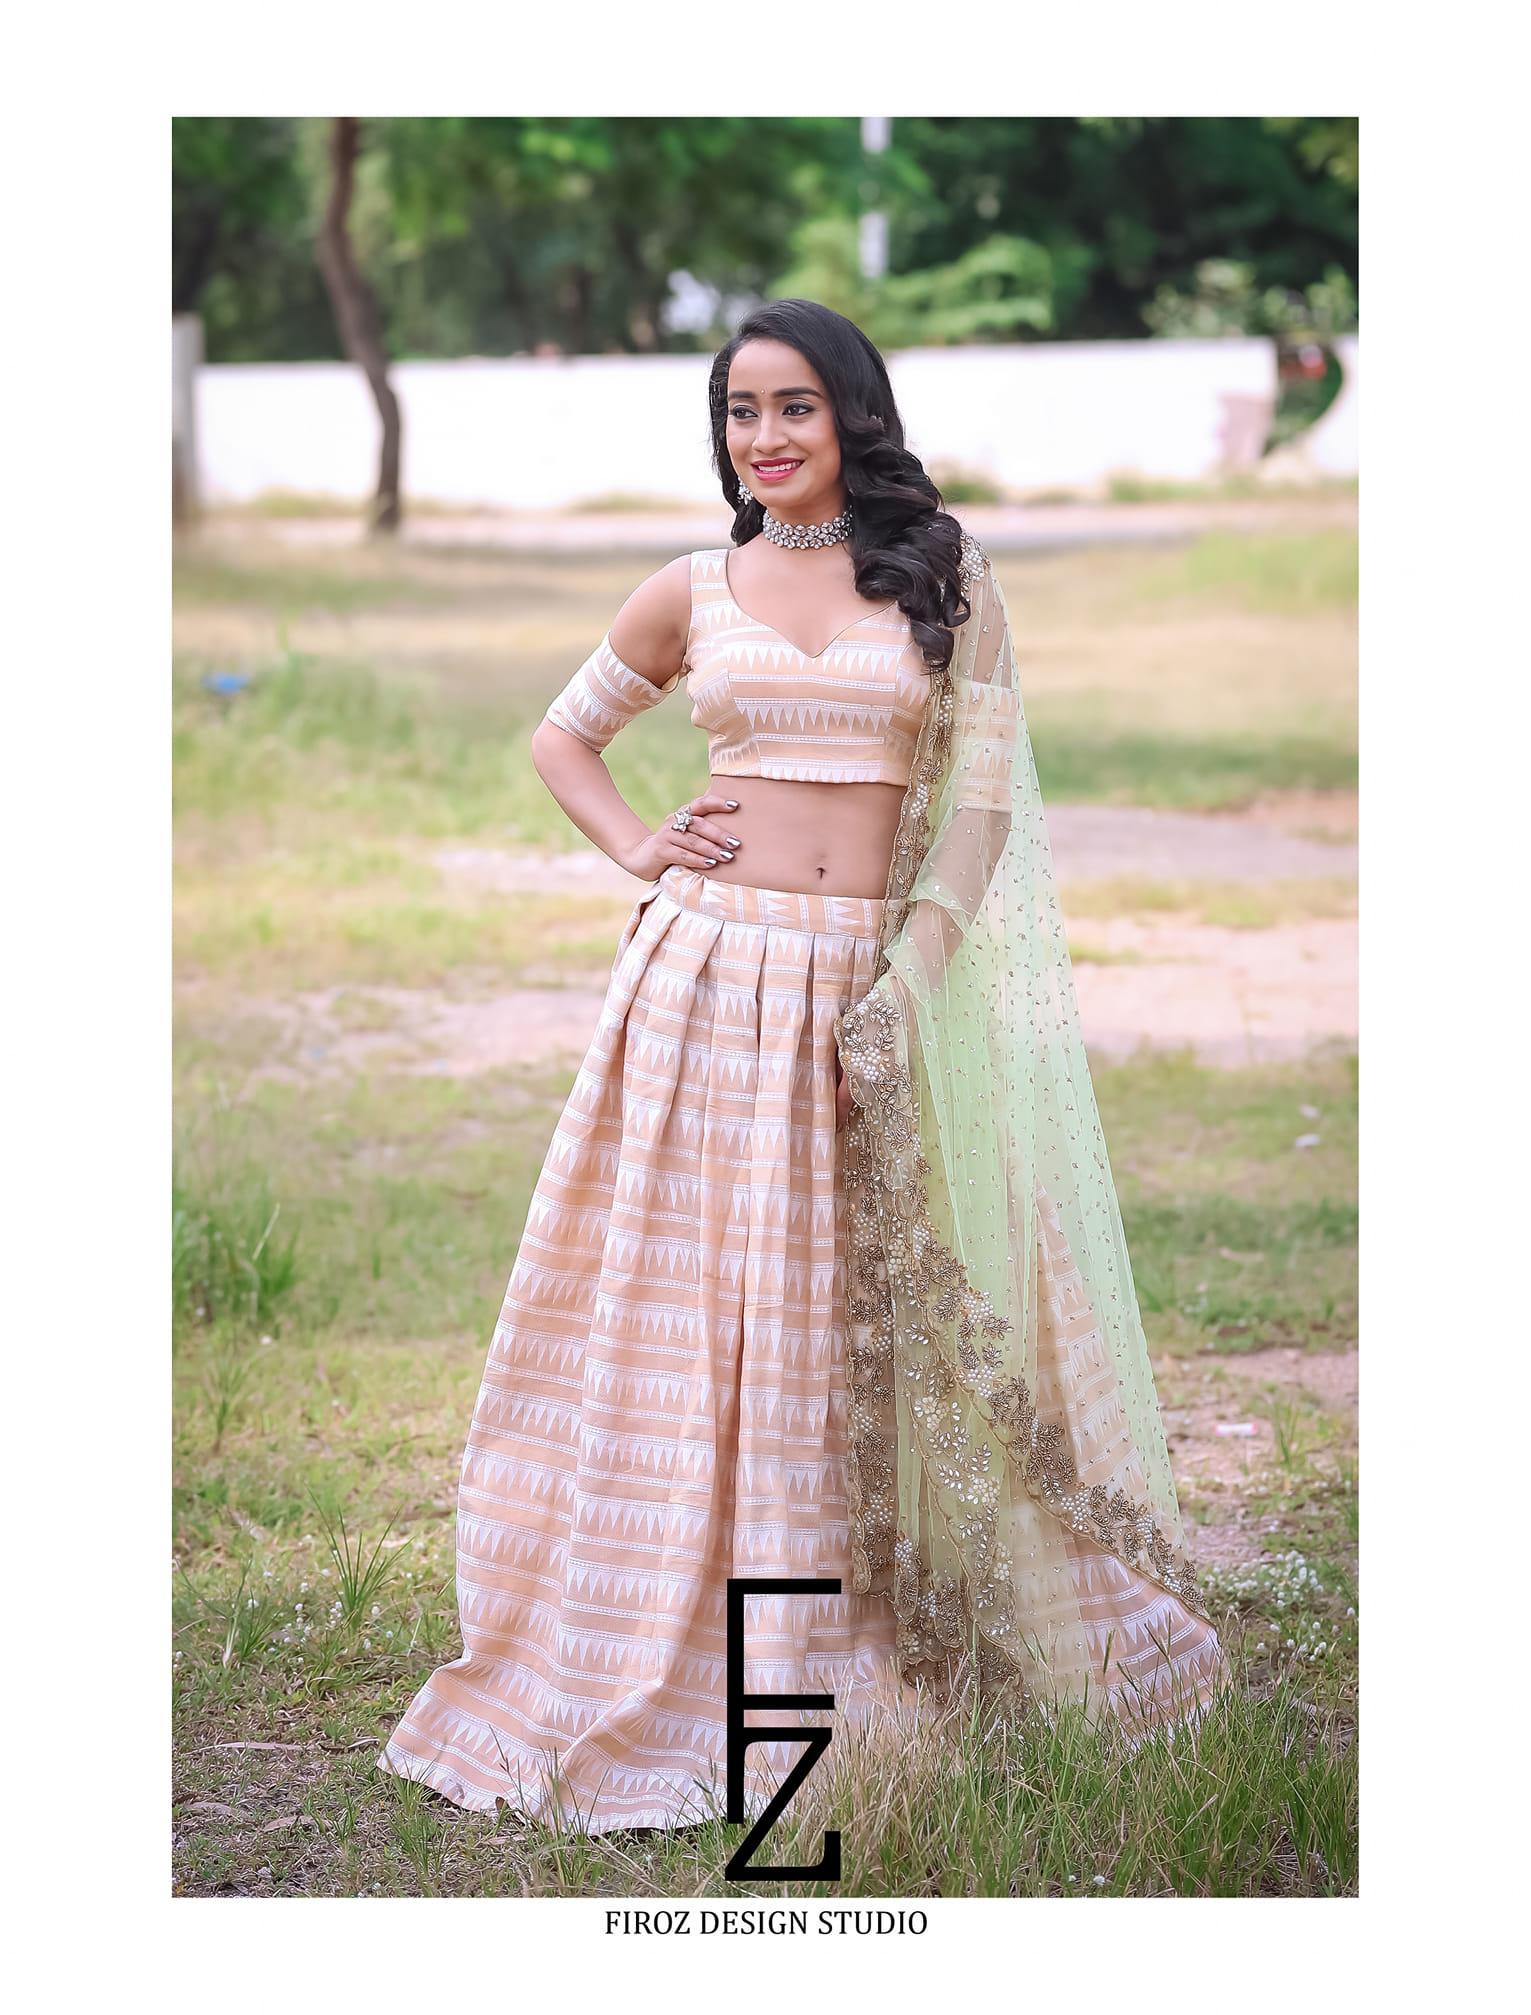 Beautiful and Charming Vindhya Vishaka in Firoz Design Studio Outfit 2021-02-23